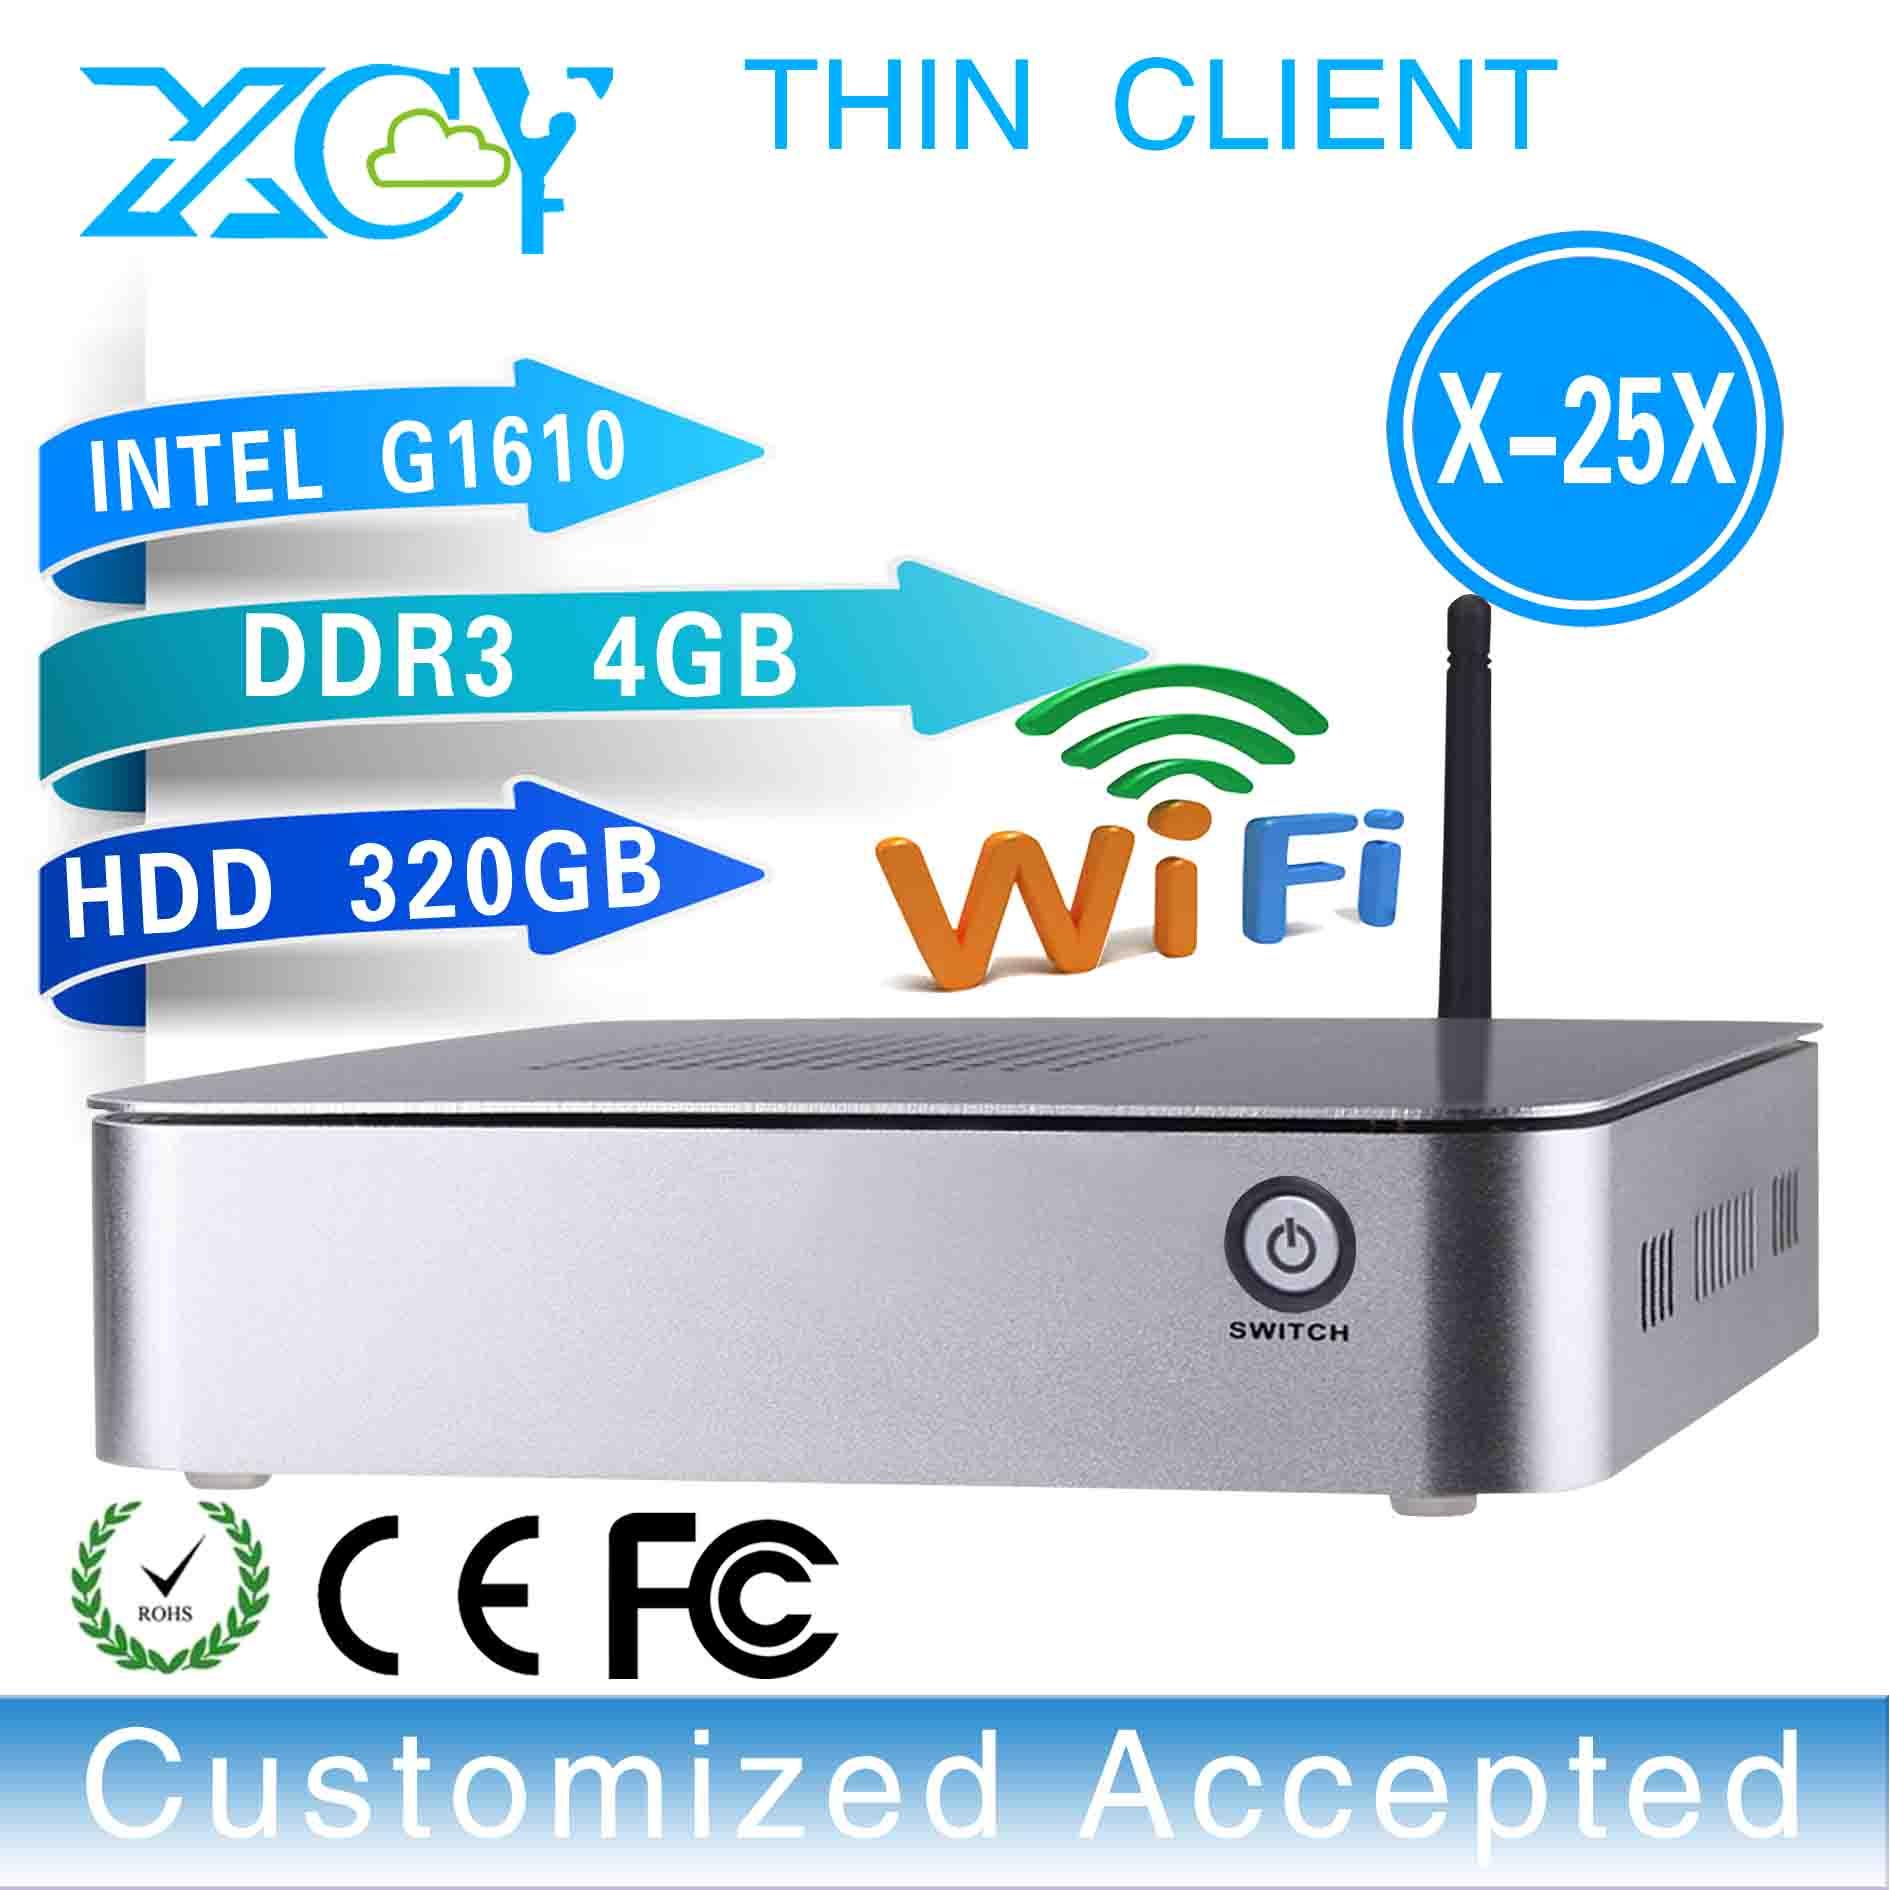 Can OEM/ODM MINI PC Intel Celeron G1610 4G/320G DUAL CORE Windows 8.1 OS Fan Thin Client Laptop Computer(China (Mainland))